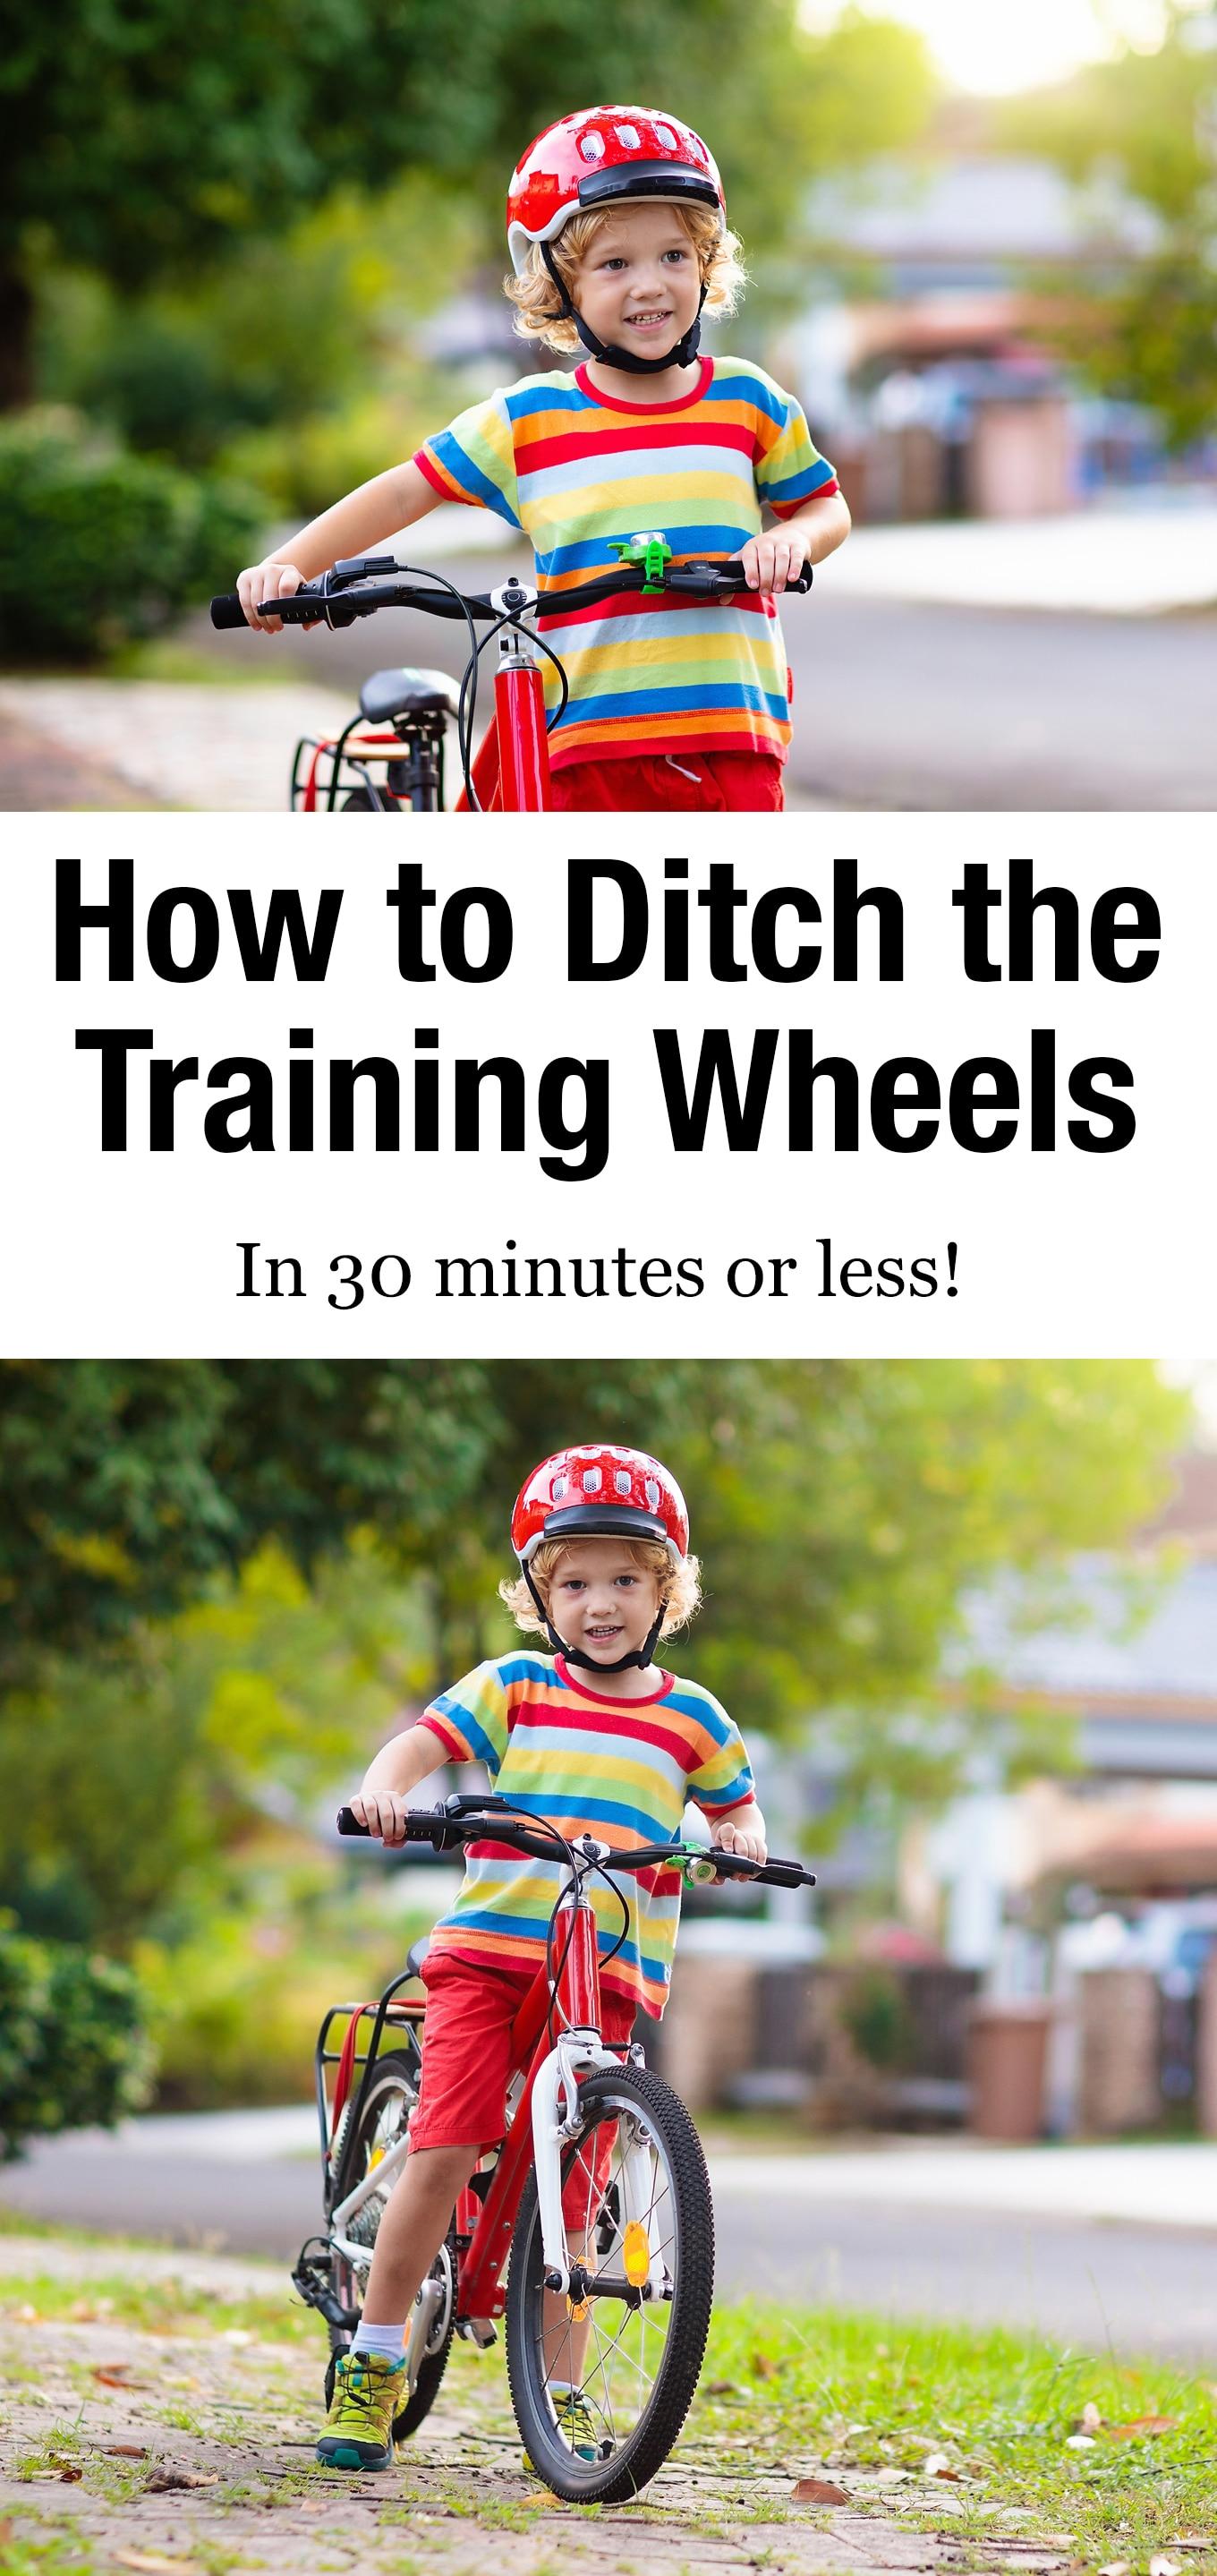 Teach your child how to ride a bike in 30 minutes or less with proven tips that work! #rideabike #teachyourchildtorideabike #preschool #bike #howtorideabike via @firefliesandmudpies